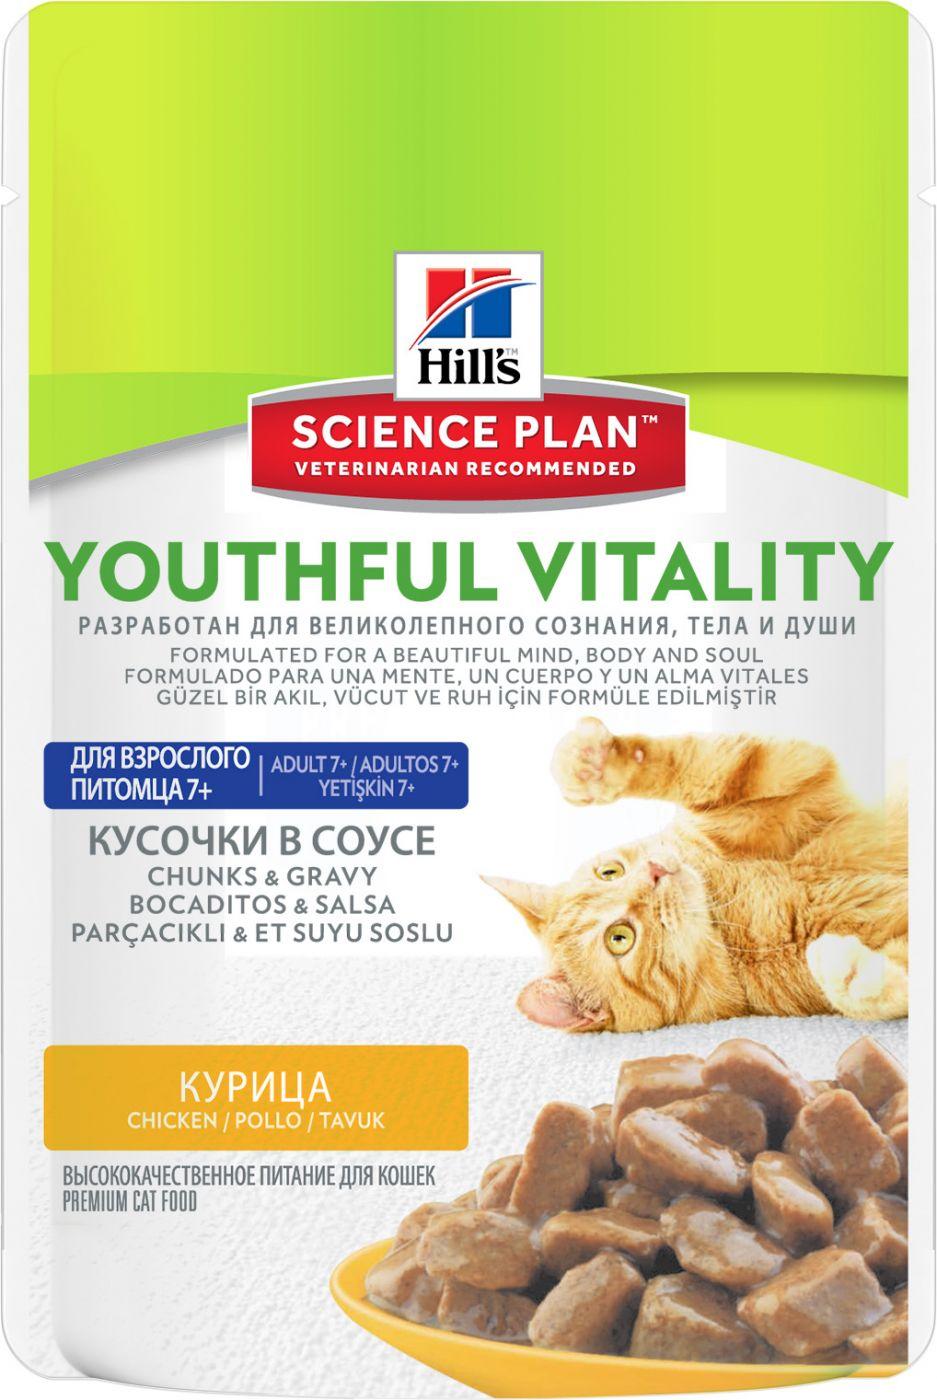 Hill's Science Plan Feline A7+ YV Chicken 85 гр.